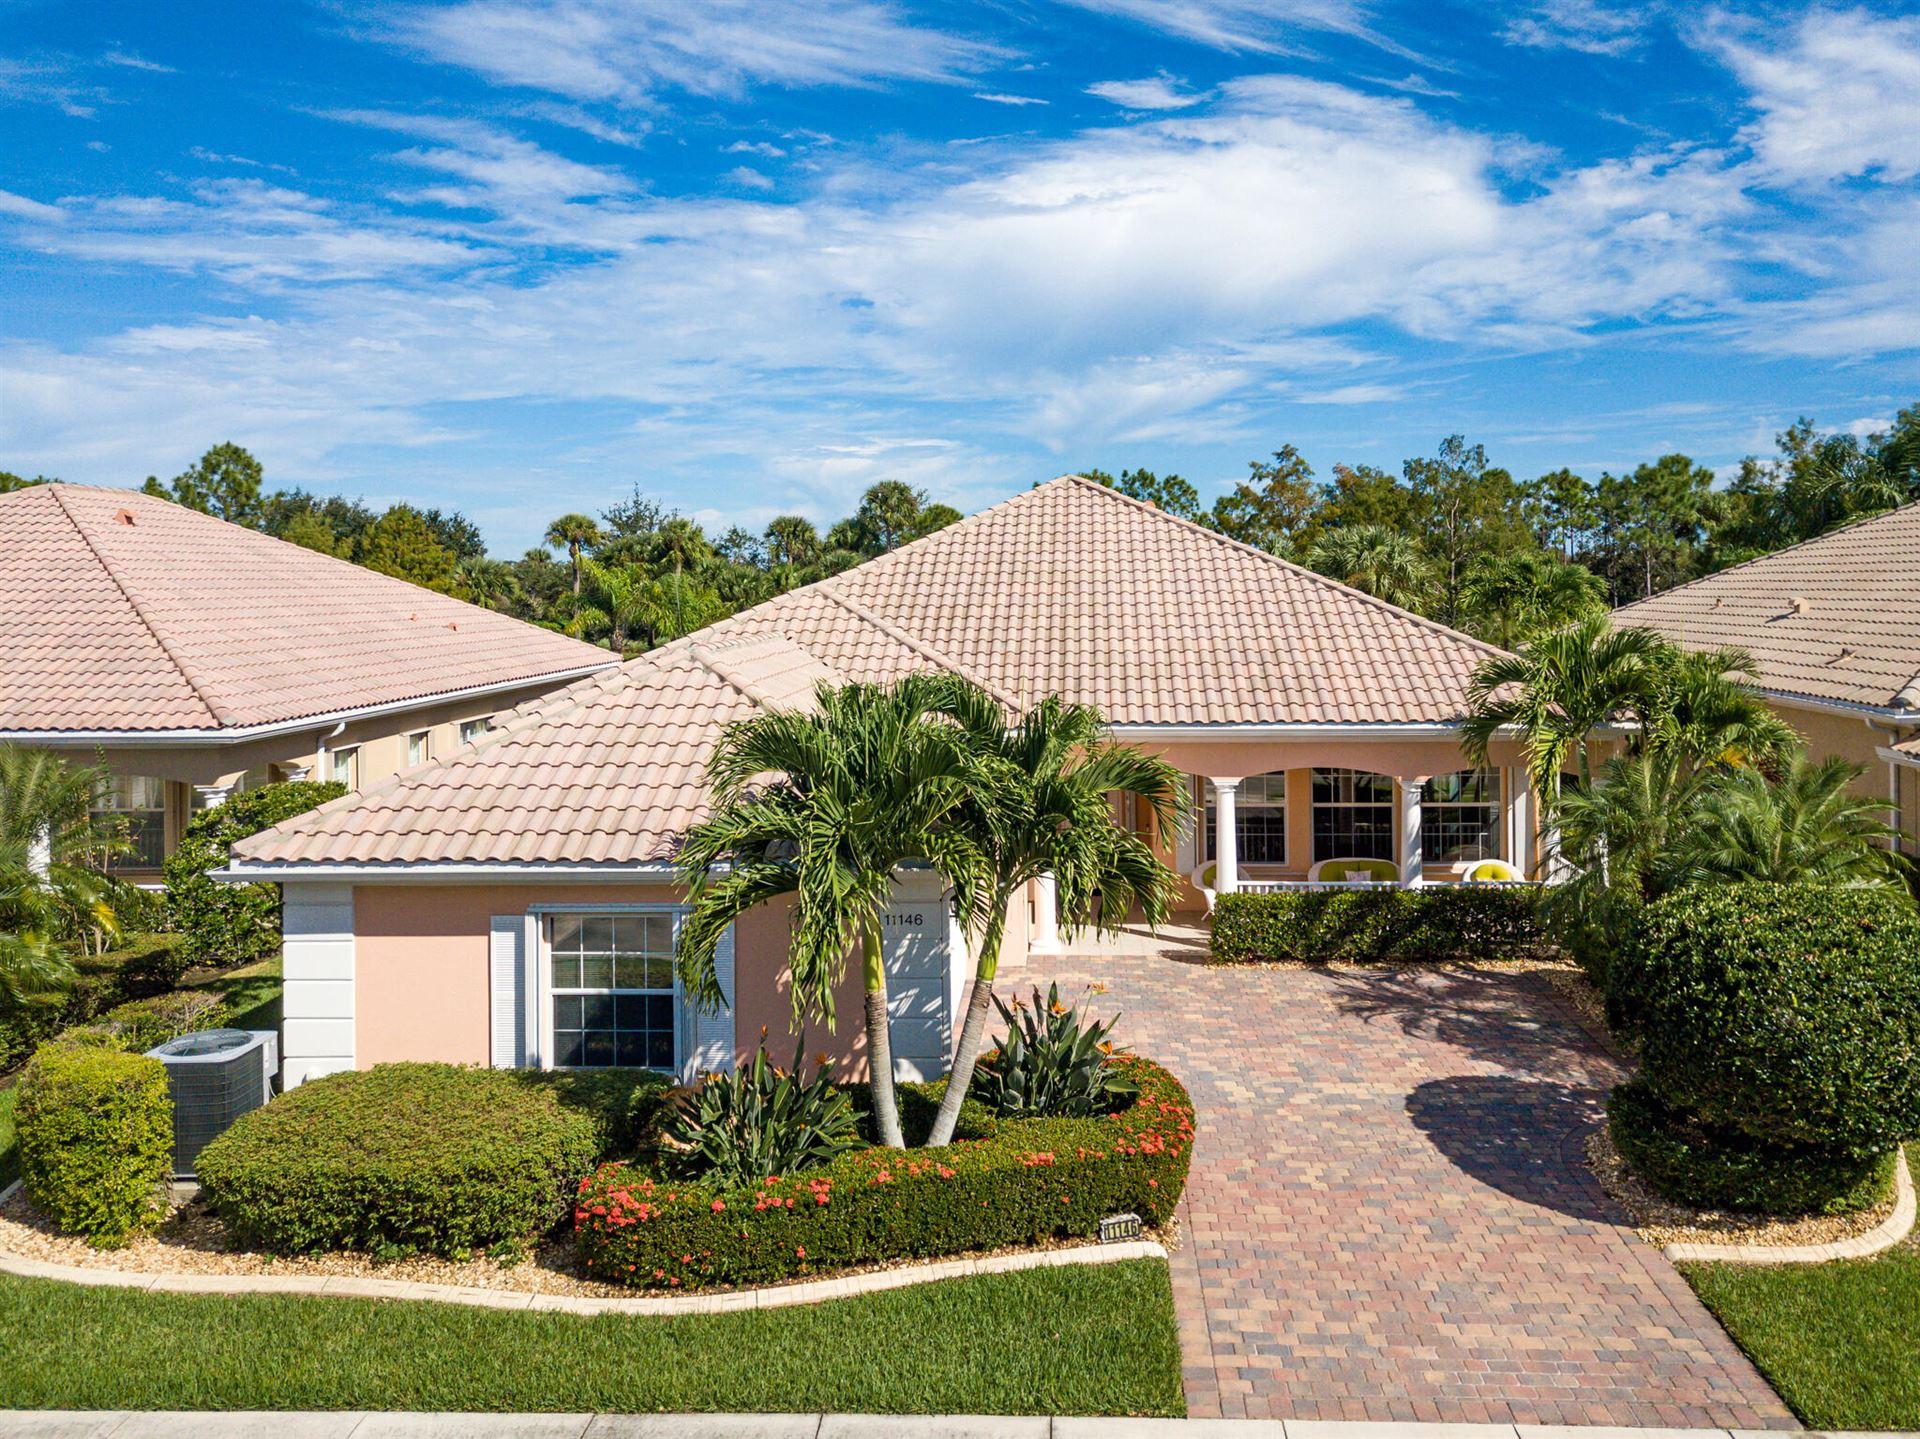 Photo of 11146 SW Olmstead Drive, Port Saint Lucie, FL 34987 (MLS # RX-10754835)